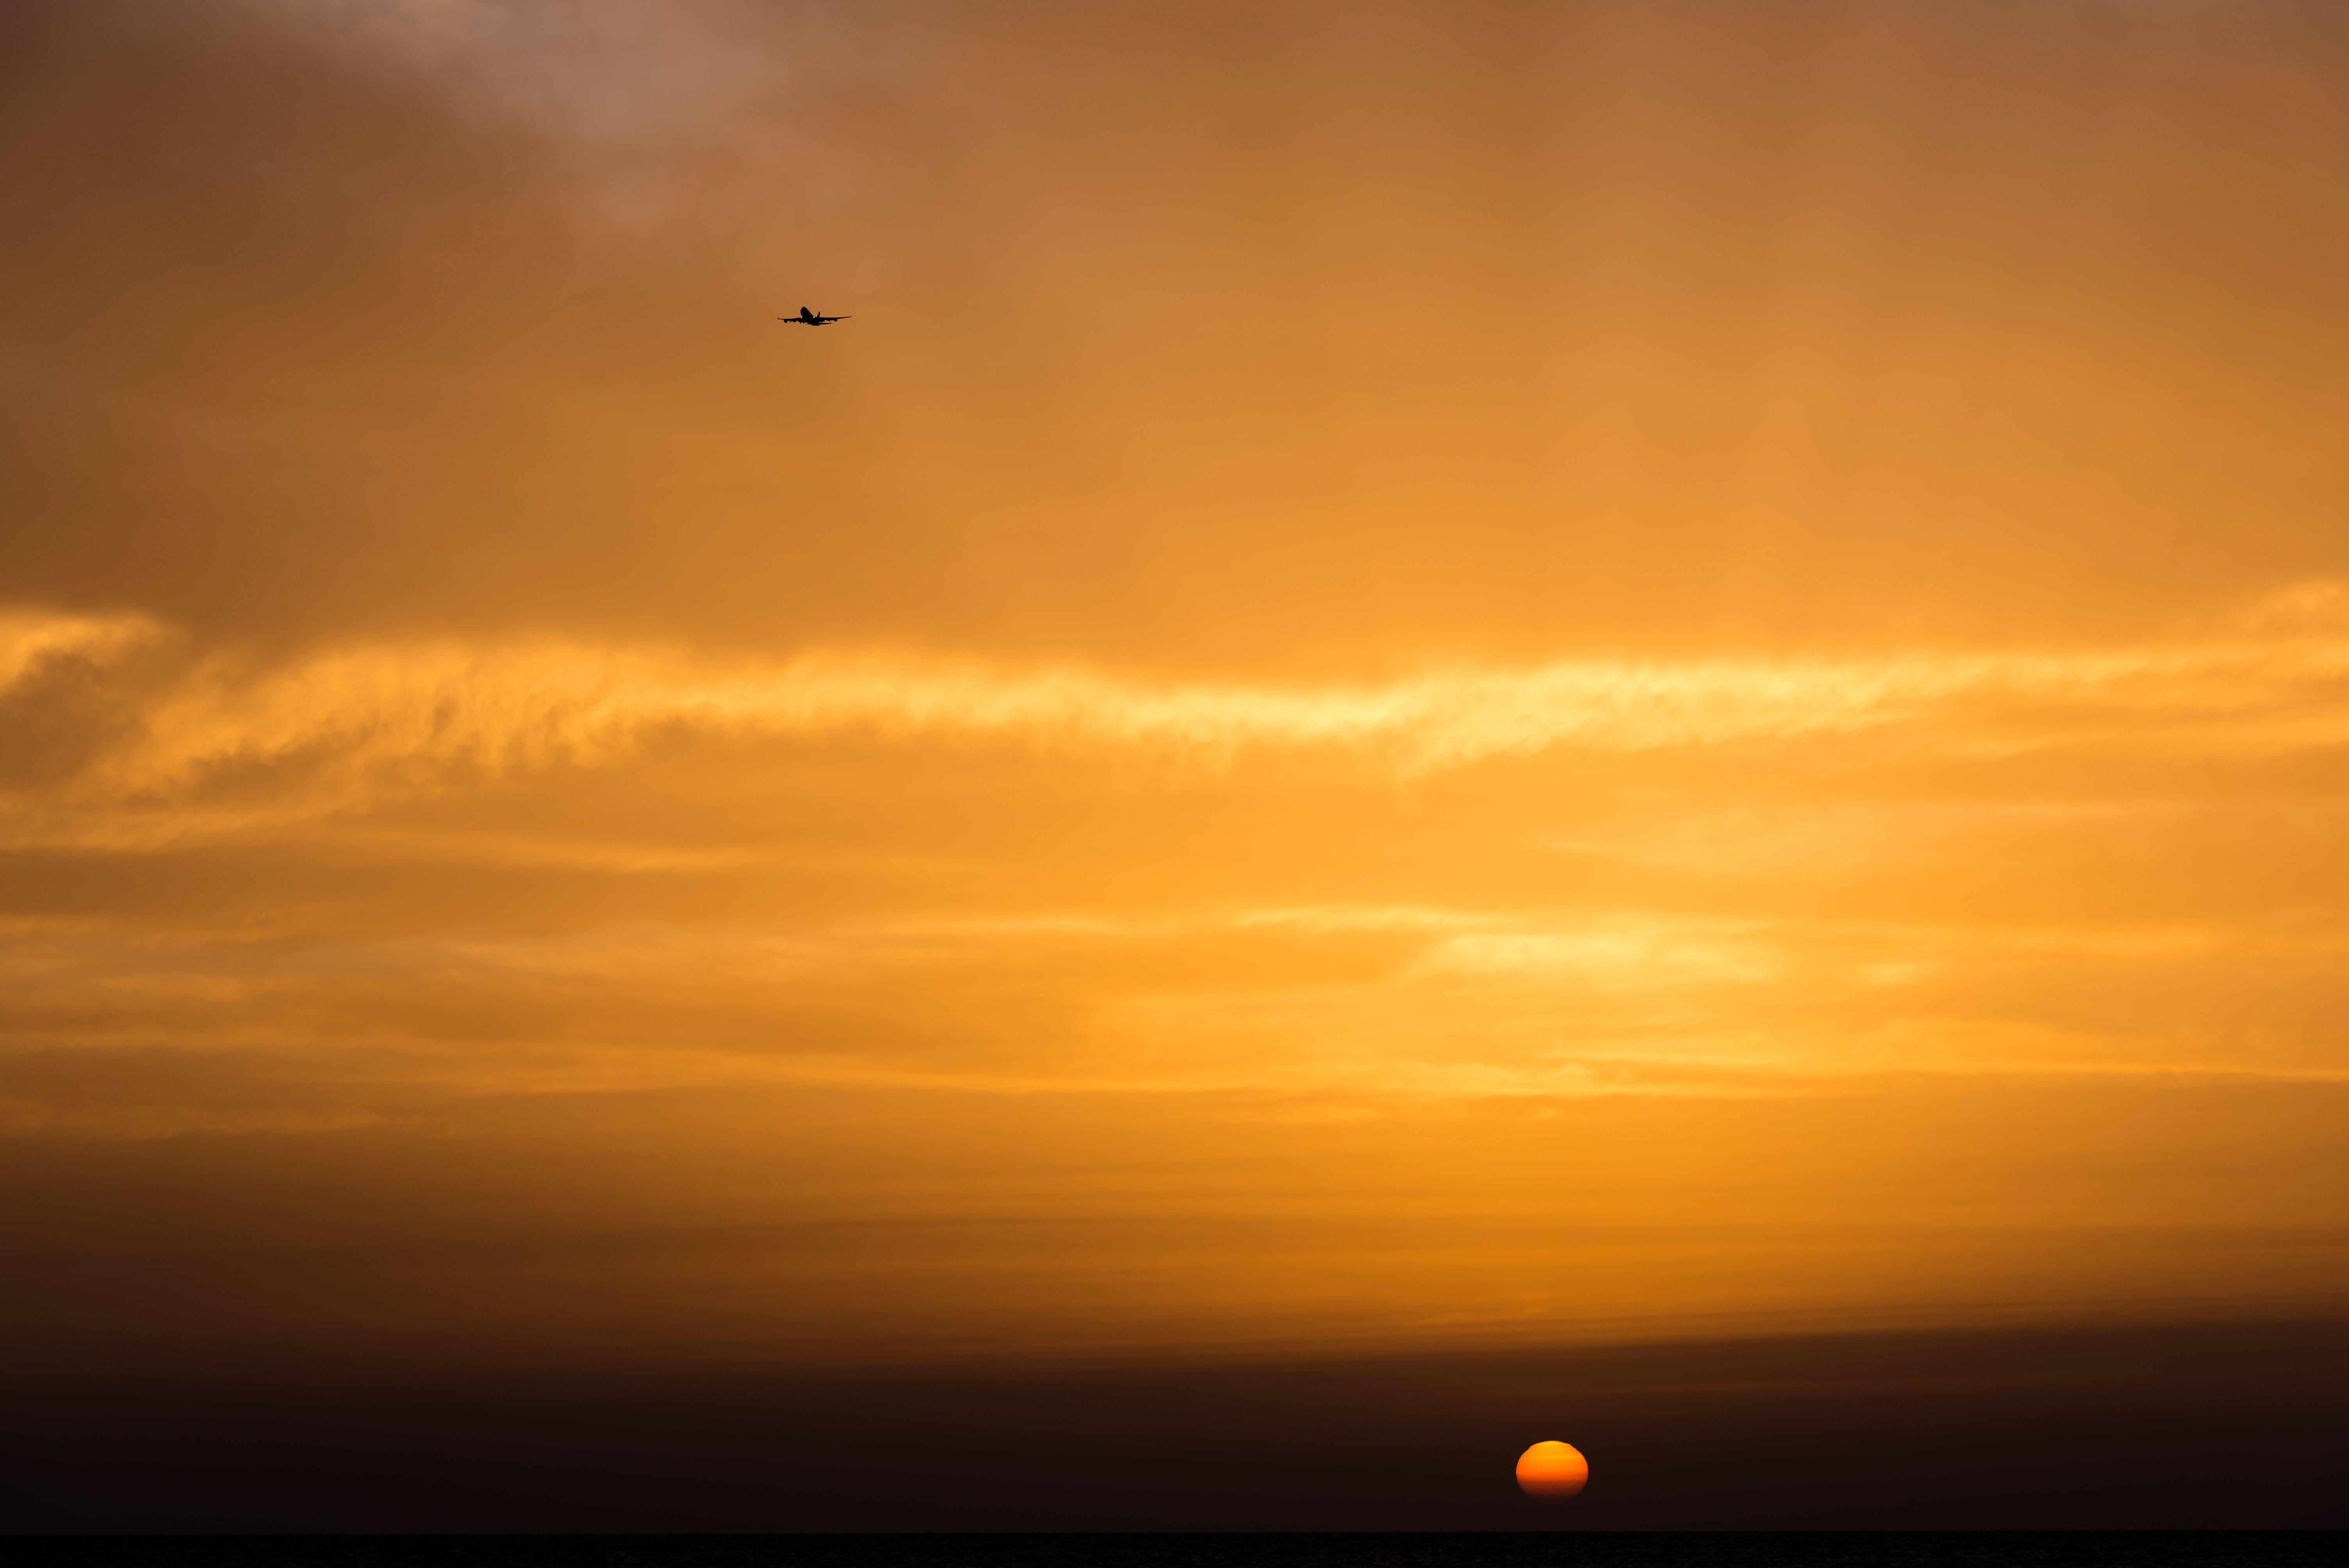 Free stock photo of airplane, calm, clouds, orange